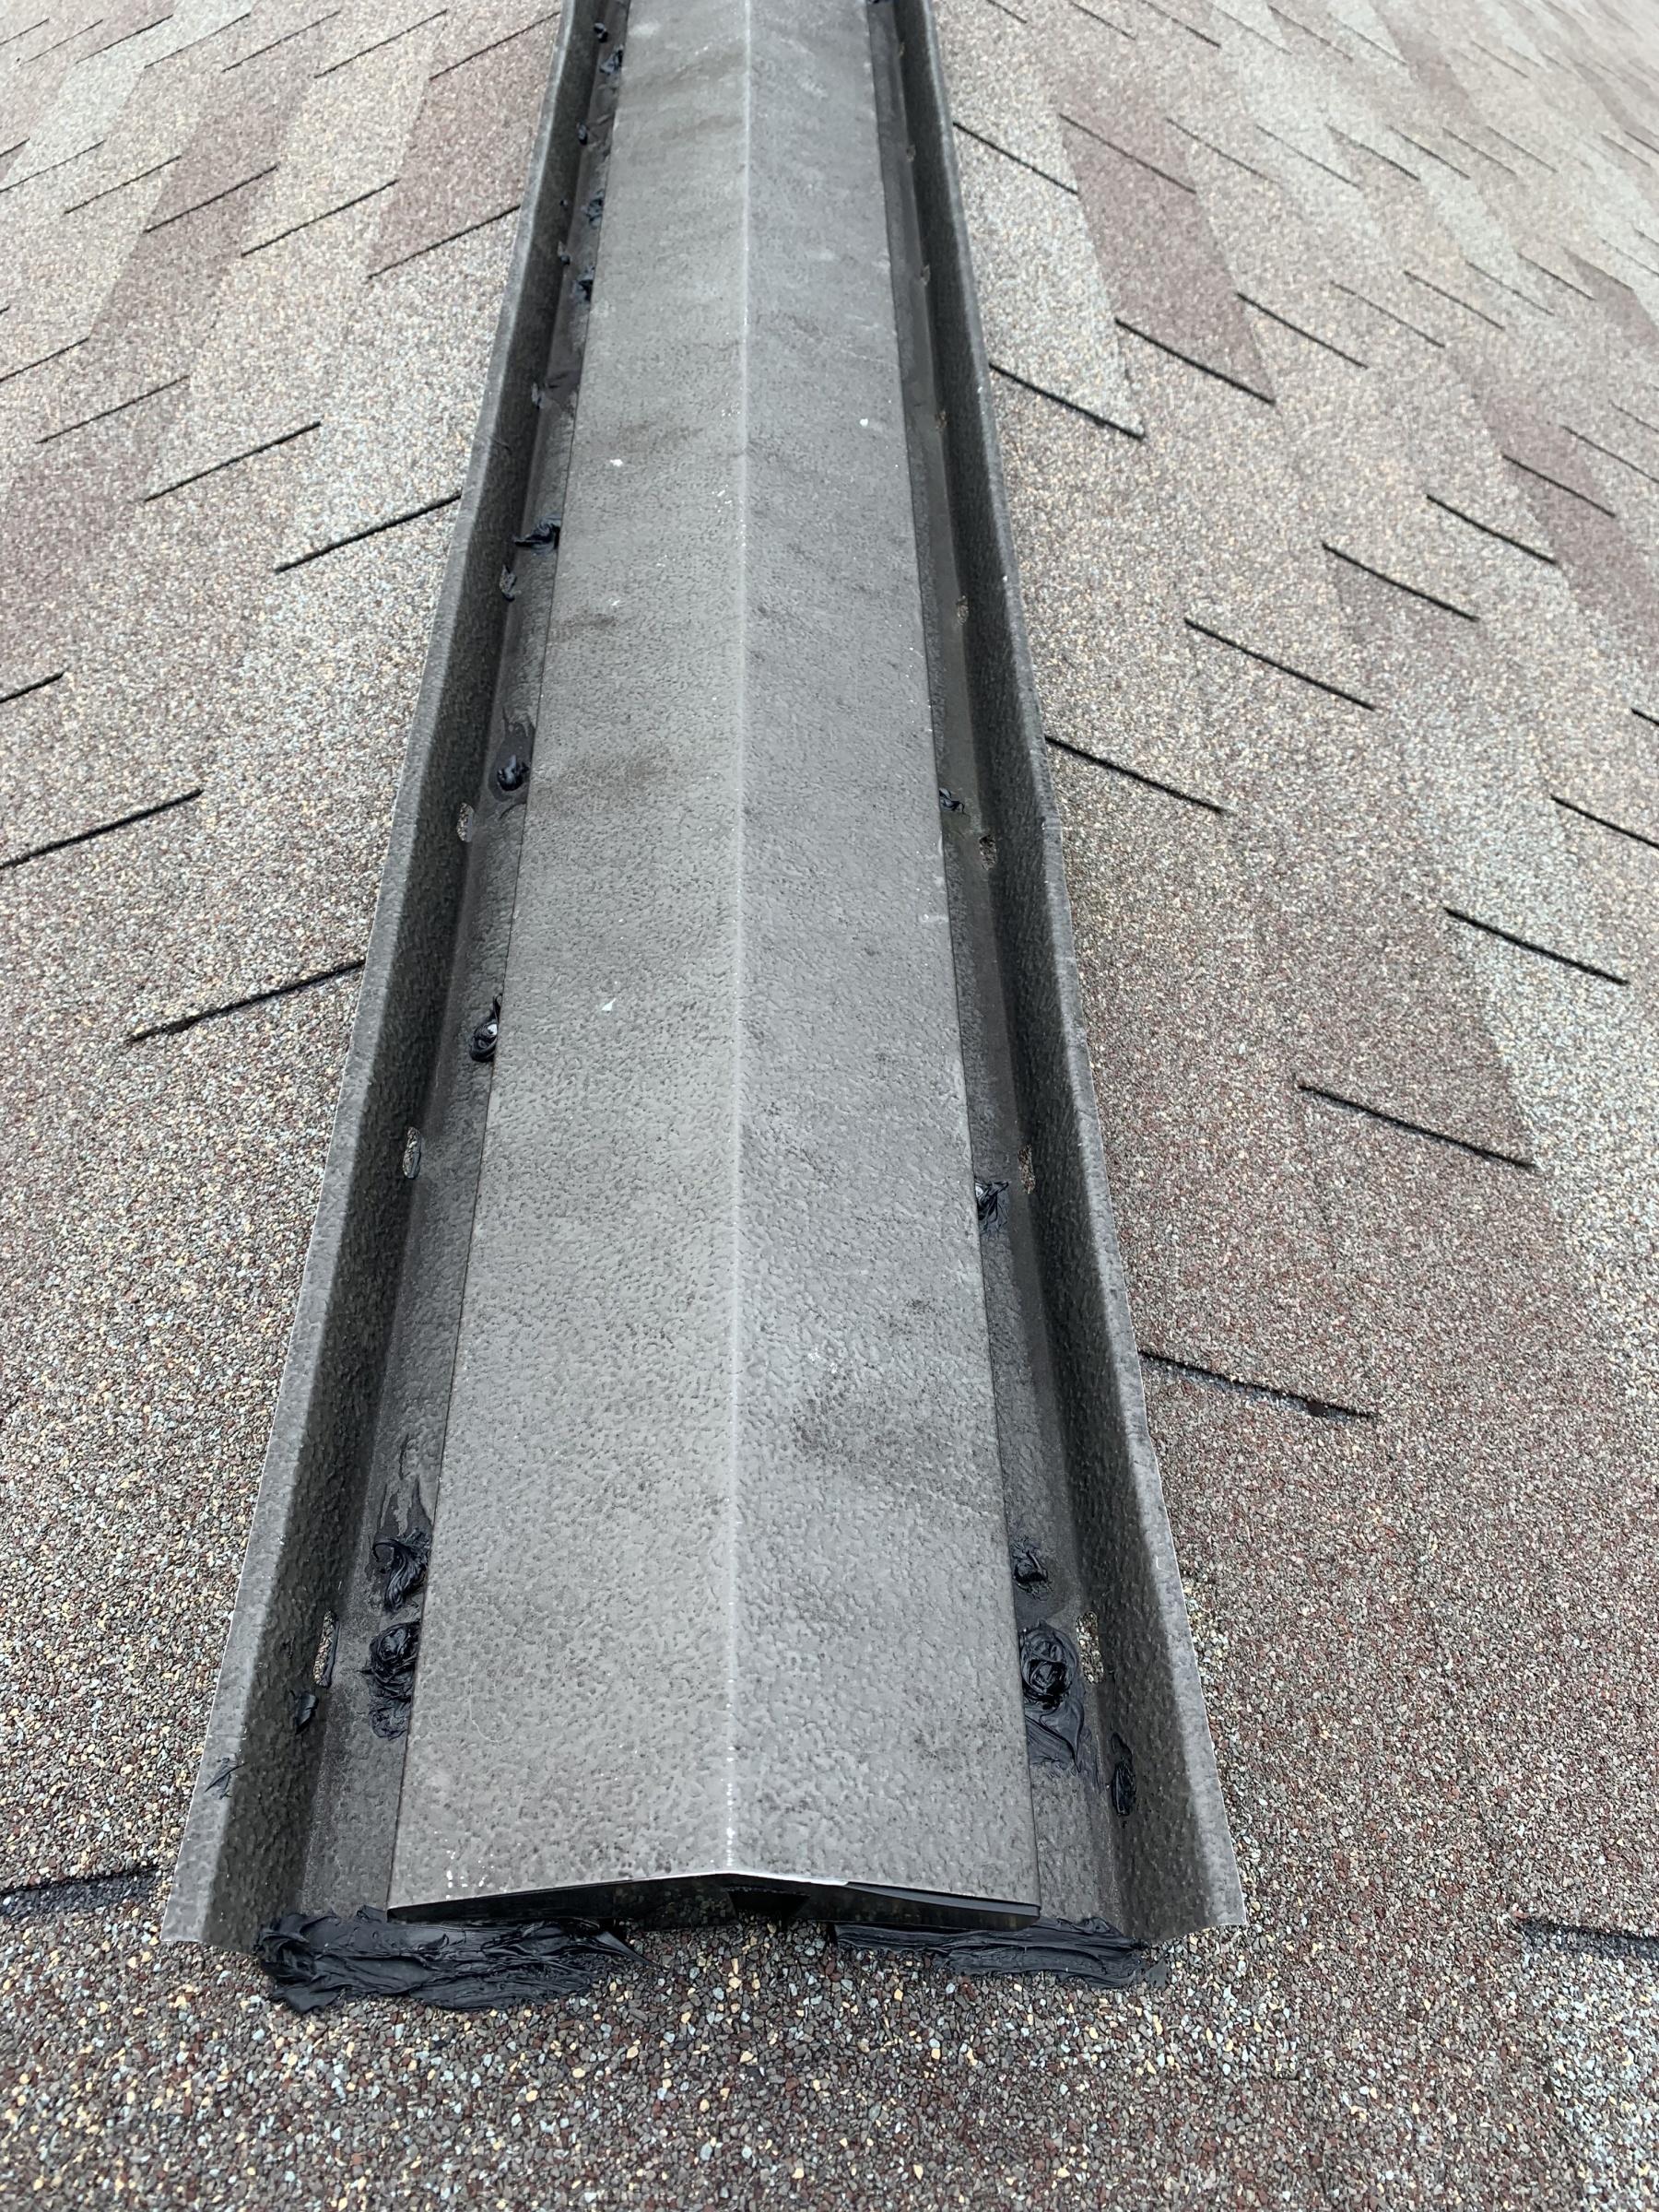 Ridge Vent Leak Roofing Siding Diy Home Improvement